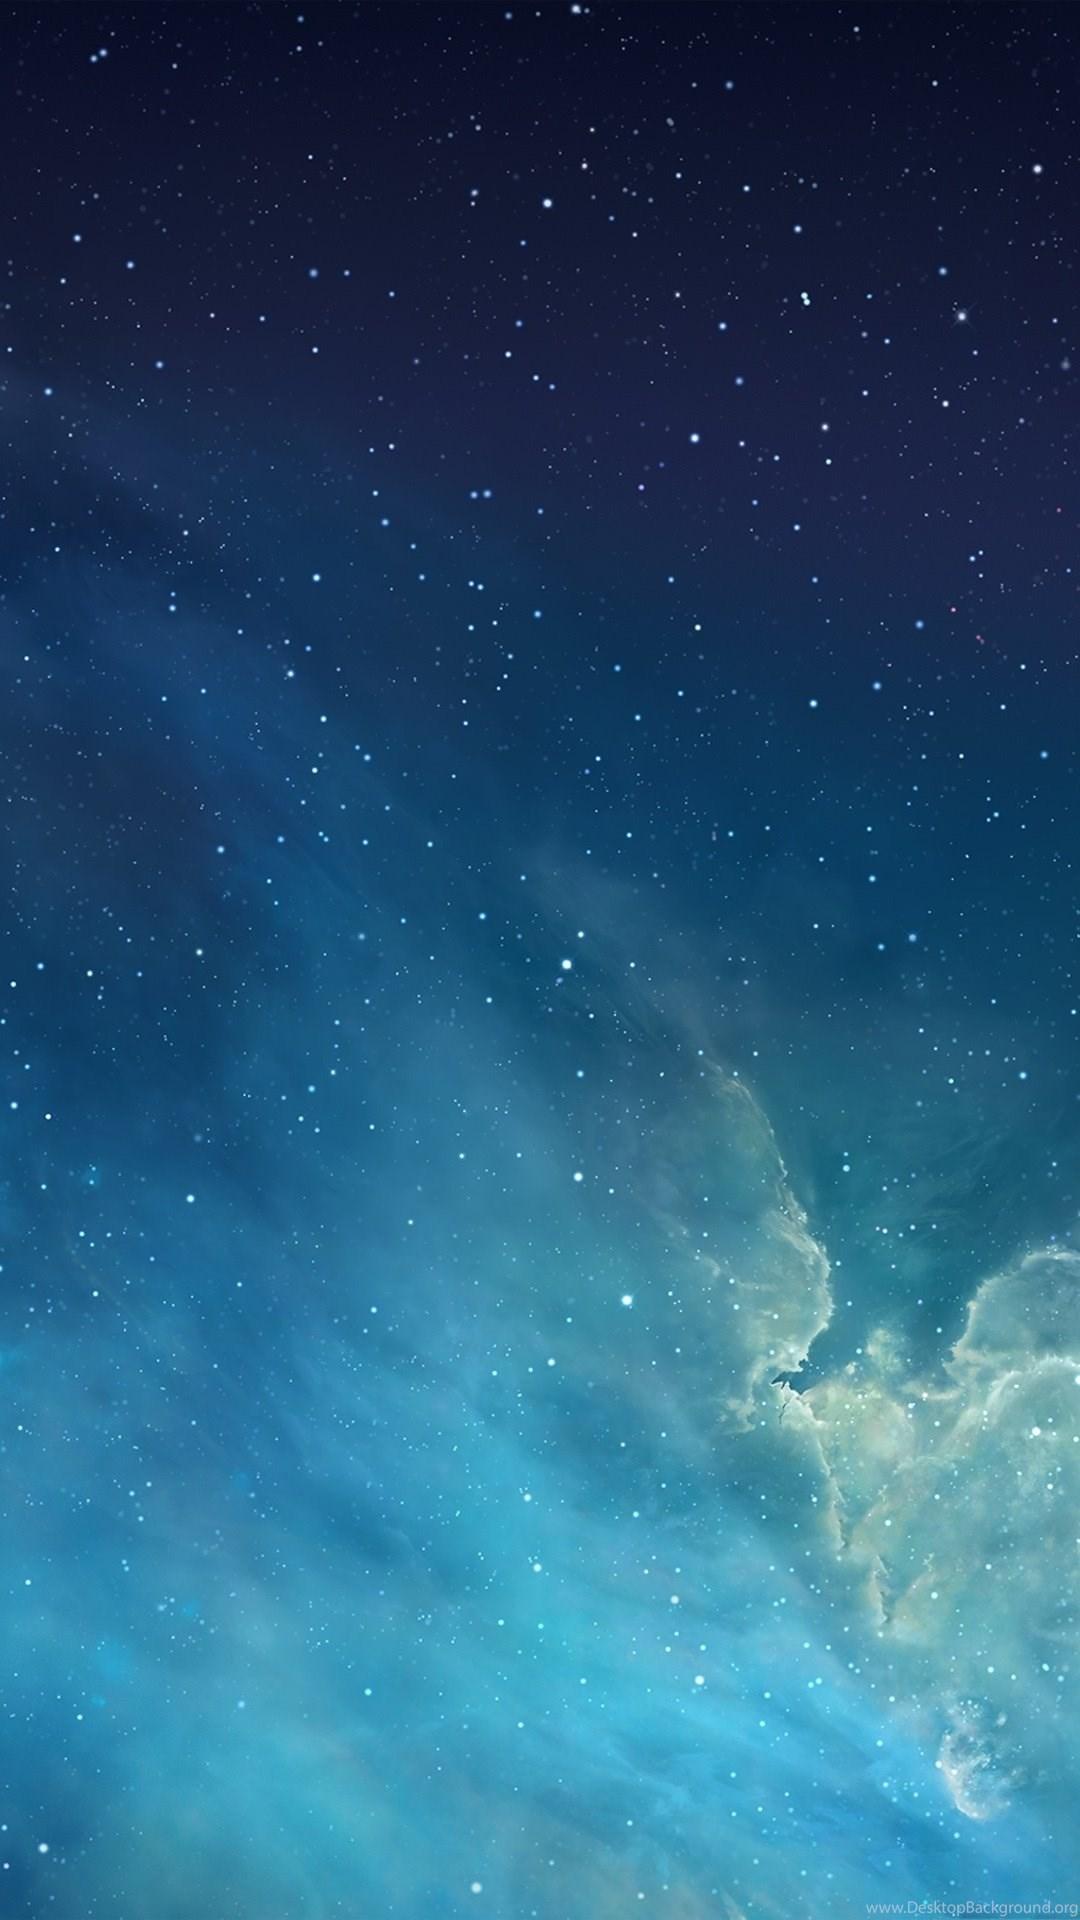 Iphone 21 Wallpapers Good K21N » WALLPAPERUN.COM Desktop Background